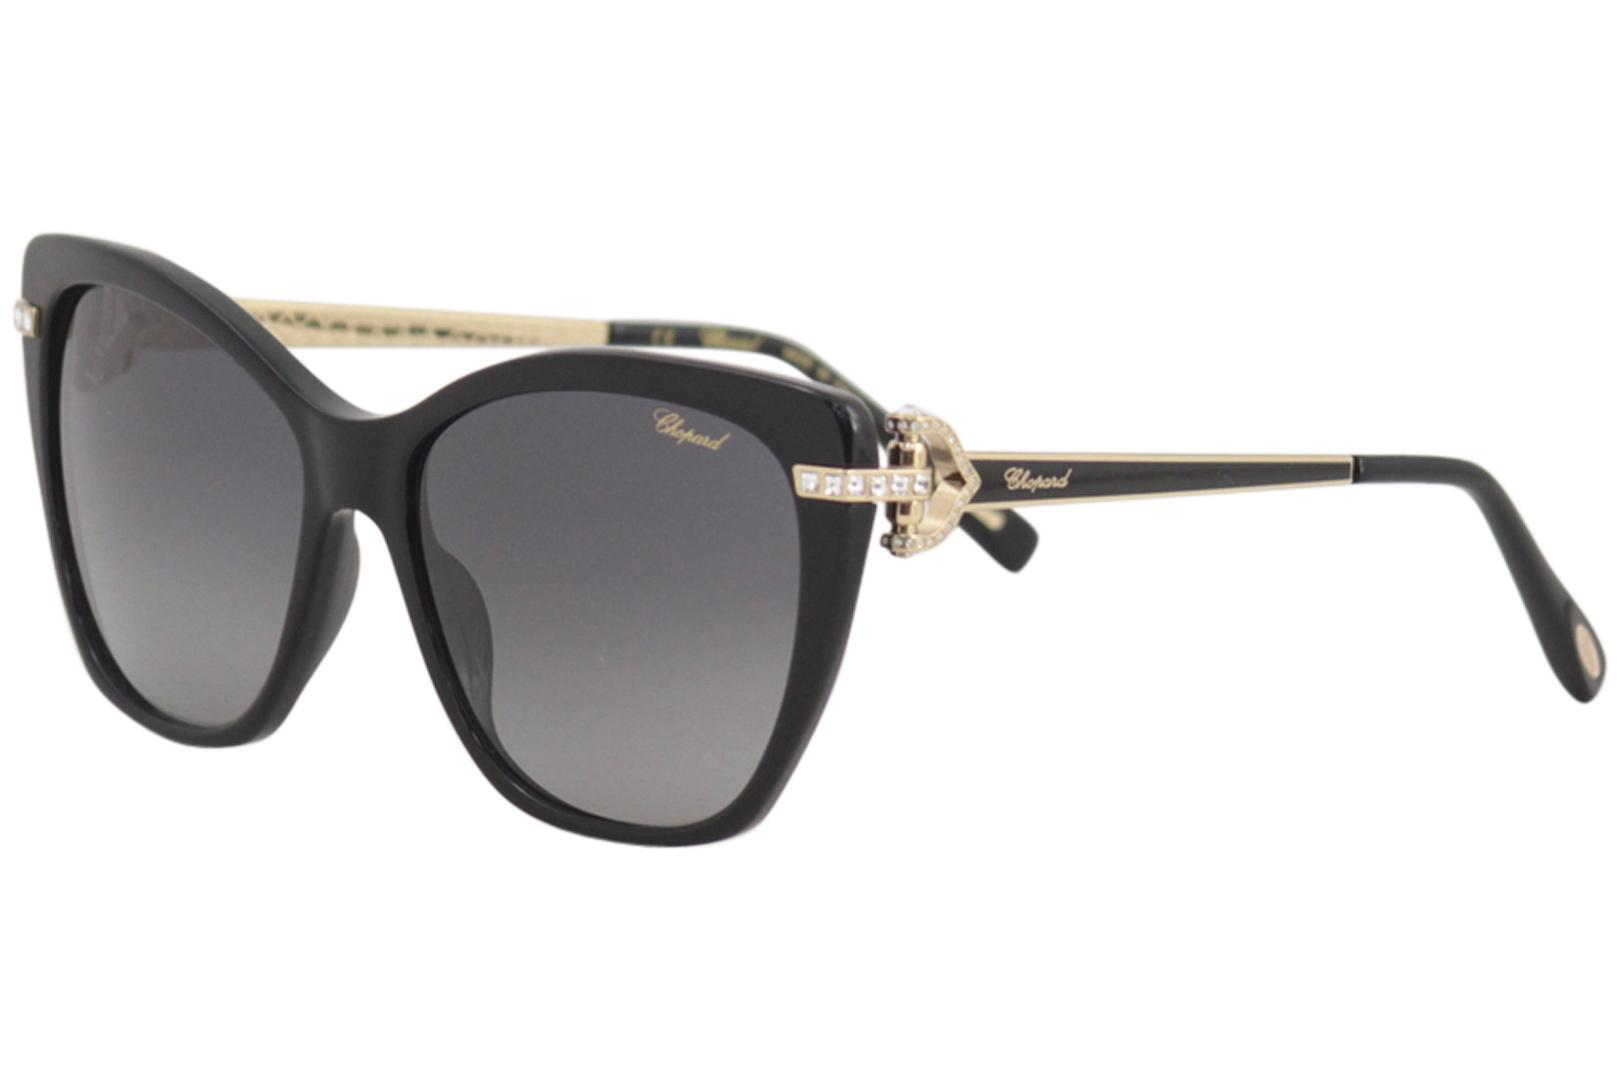 8835ed1c73 Chopard Women s SCH232S SCH 232 S Fashion Cat Eye Polarized Sunglasses